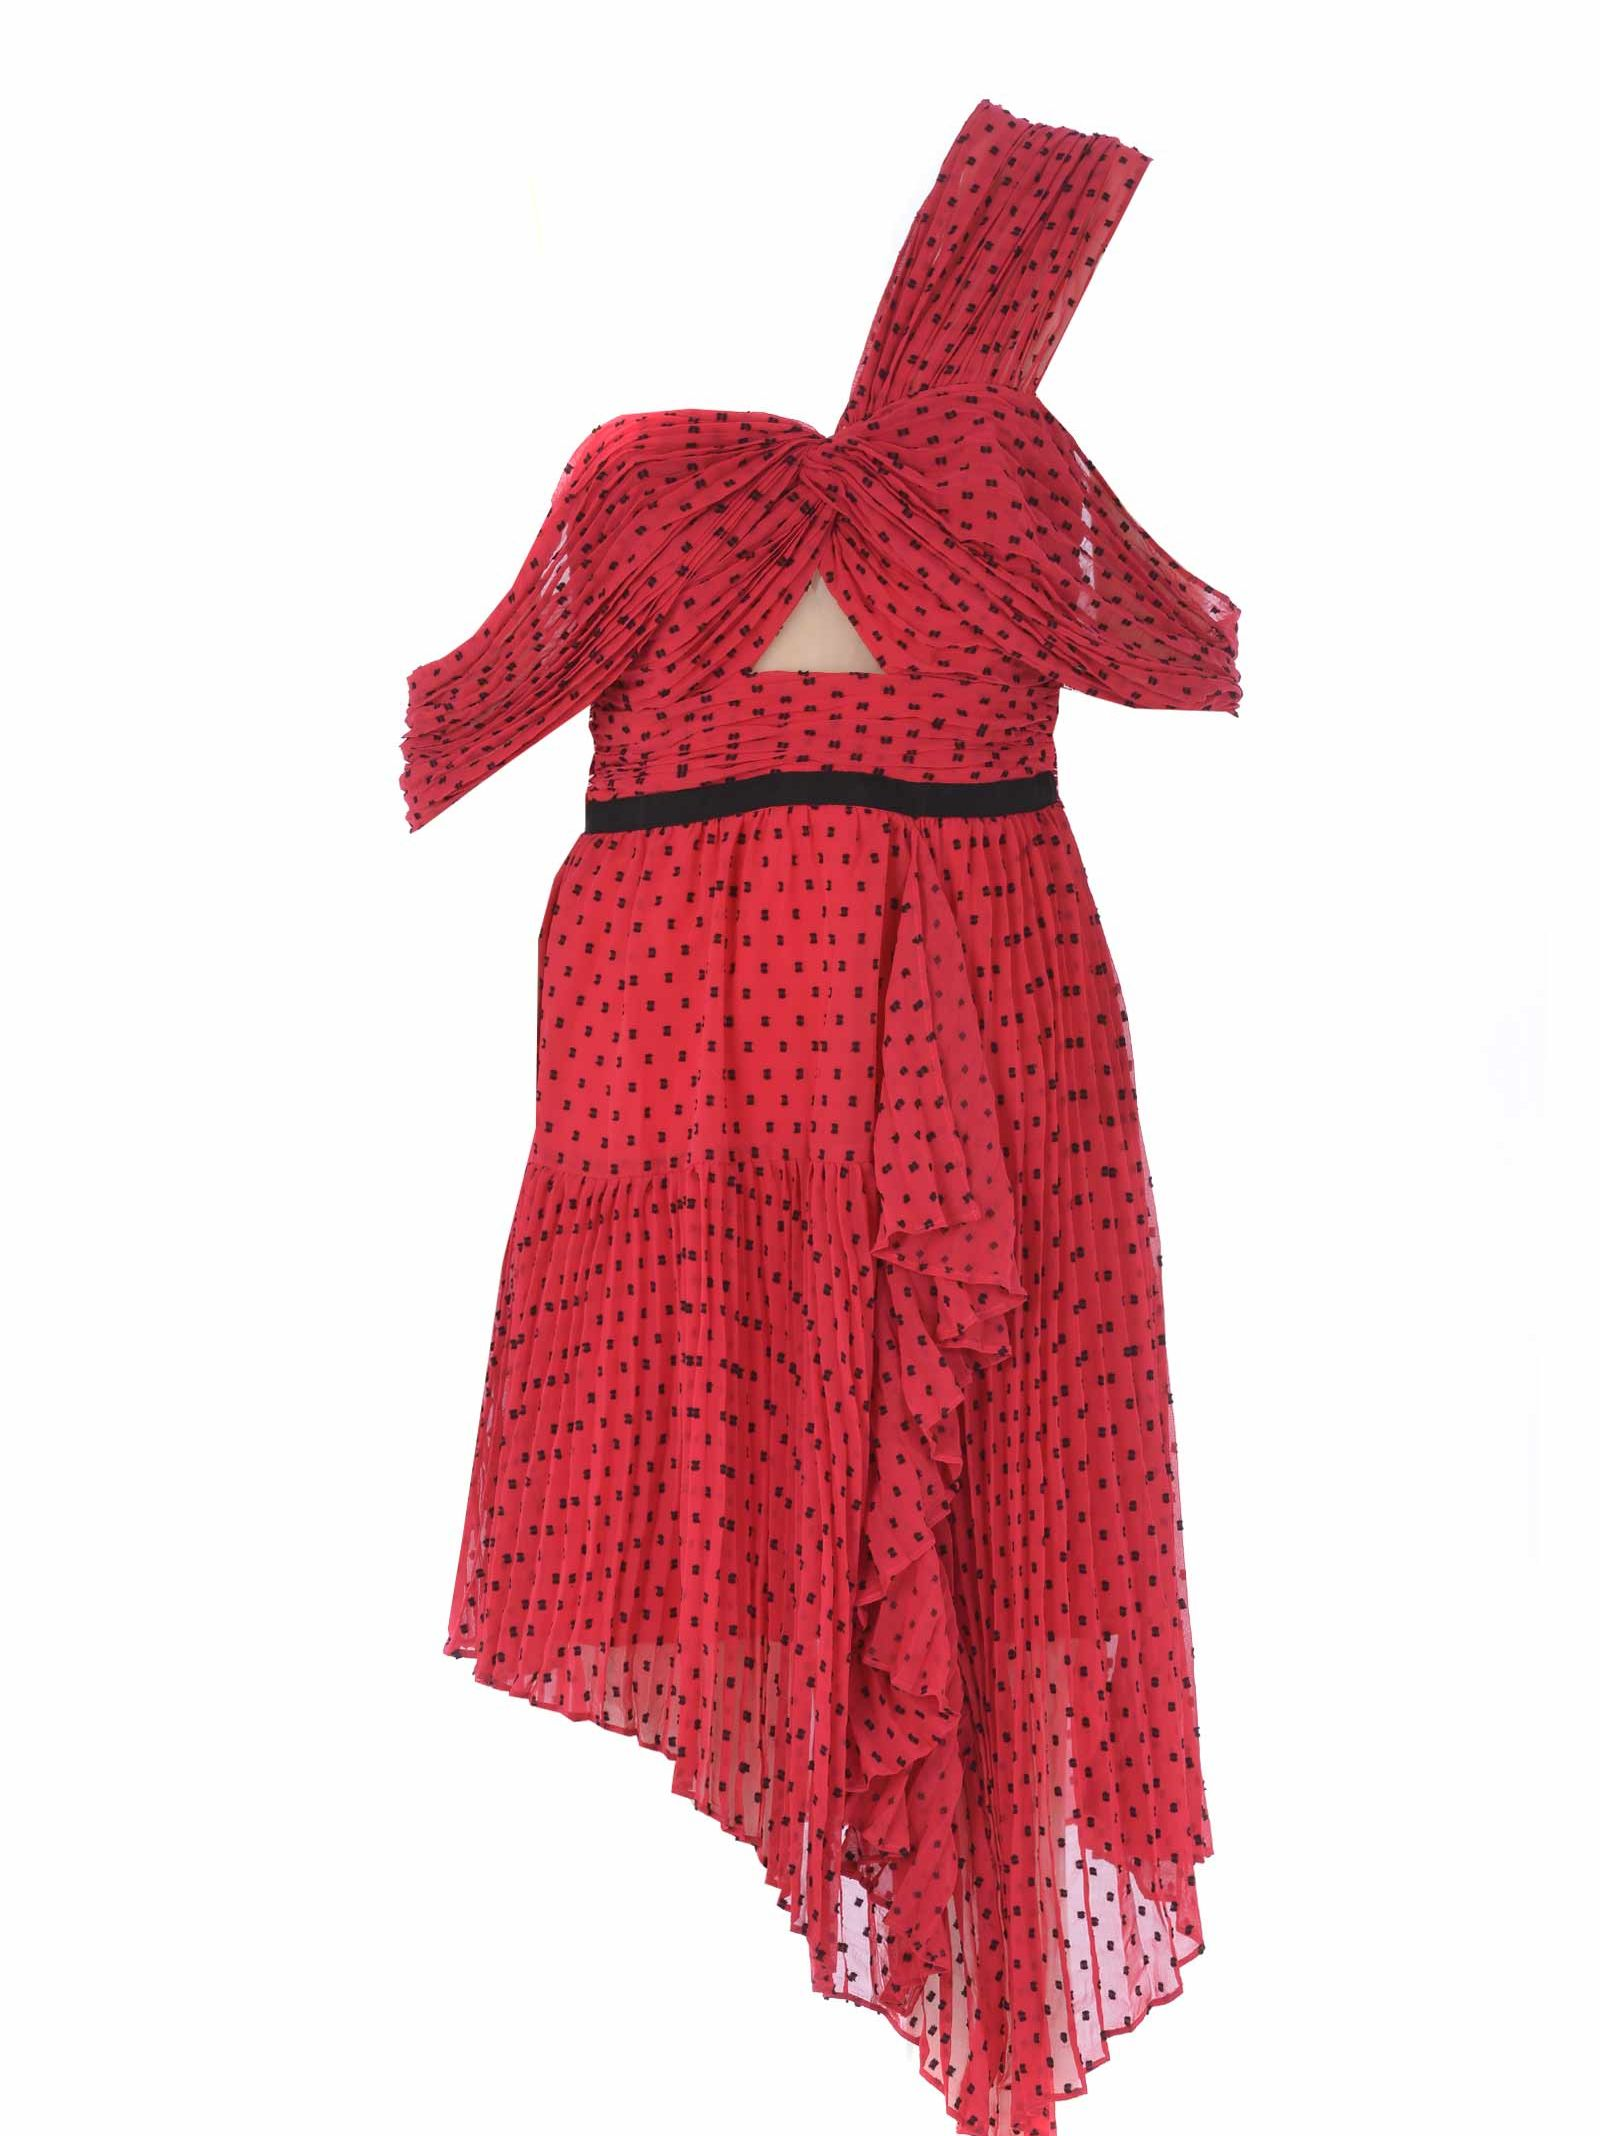 4a6137461d64 Self-Portrait Asymmetrical Polka Dot Crepe Mini Dress In Red ...